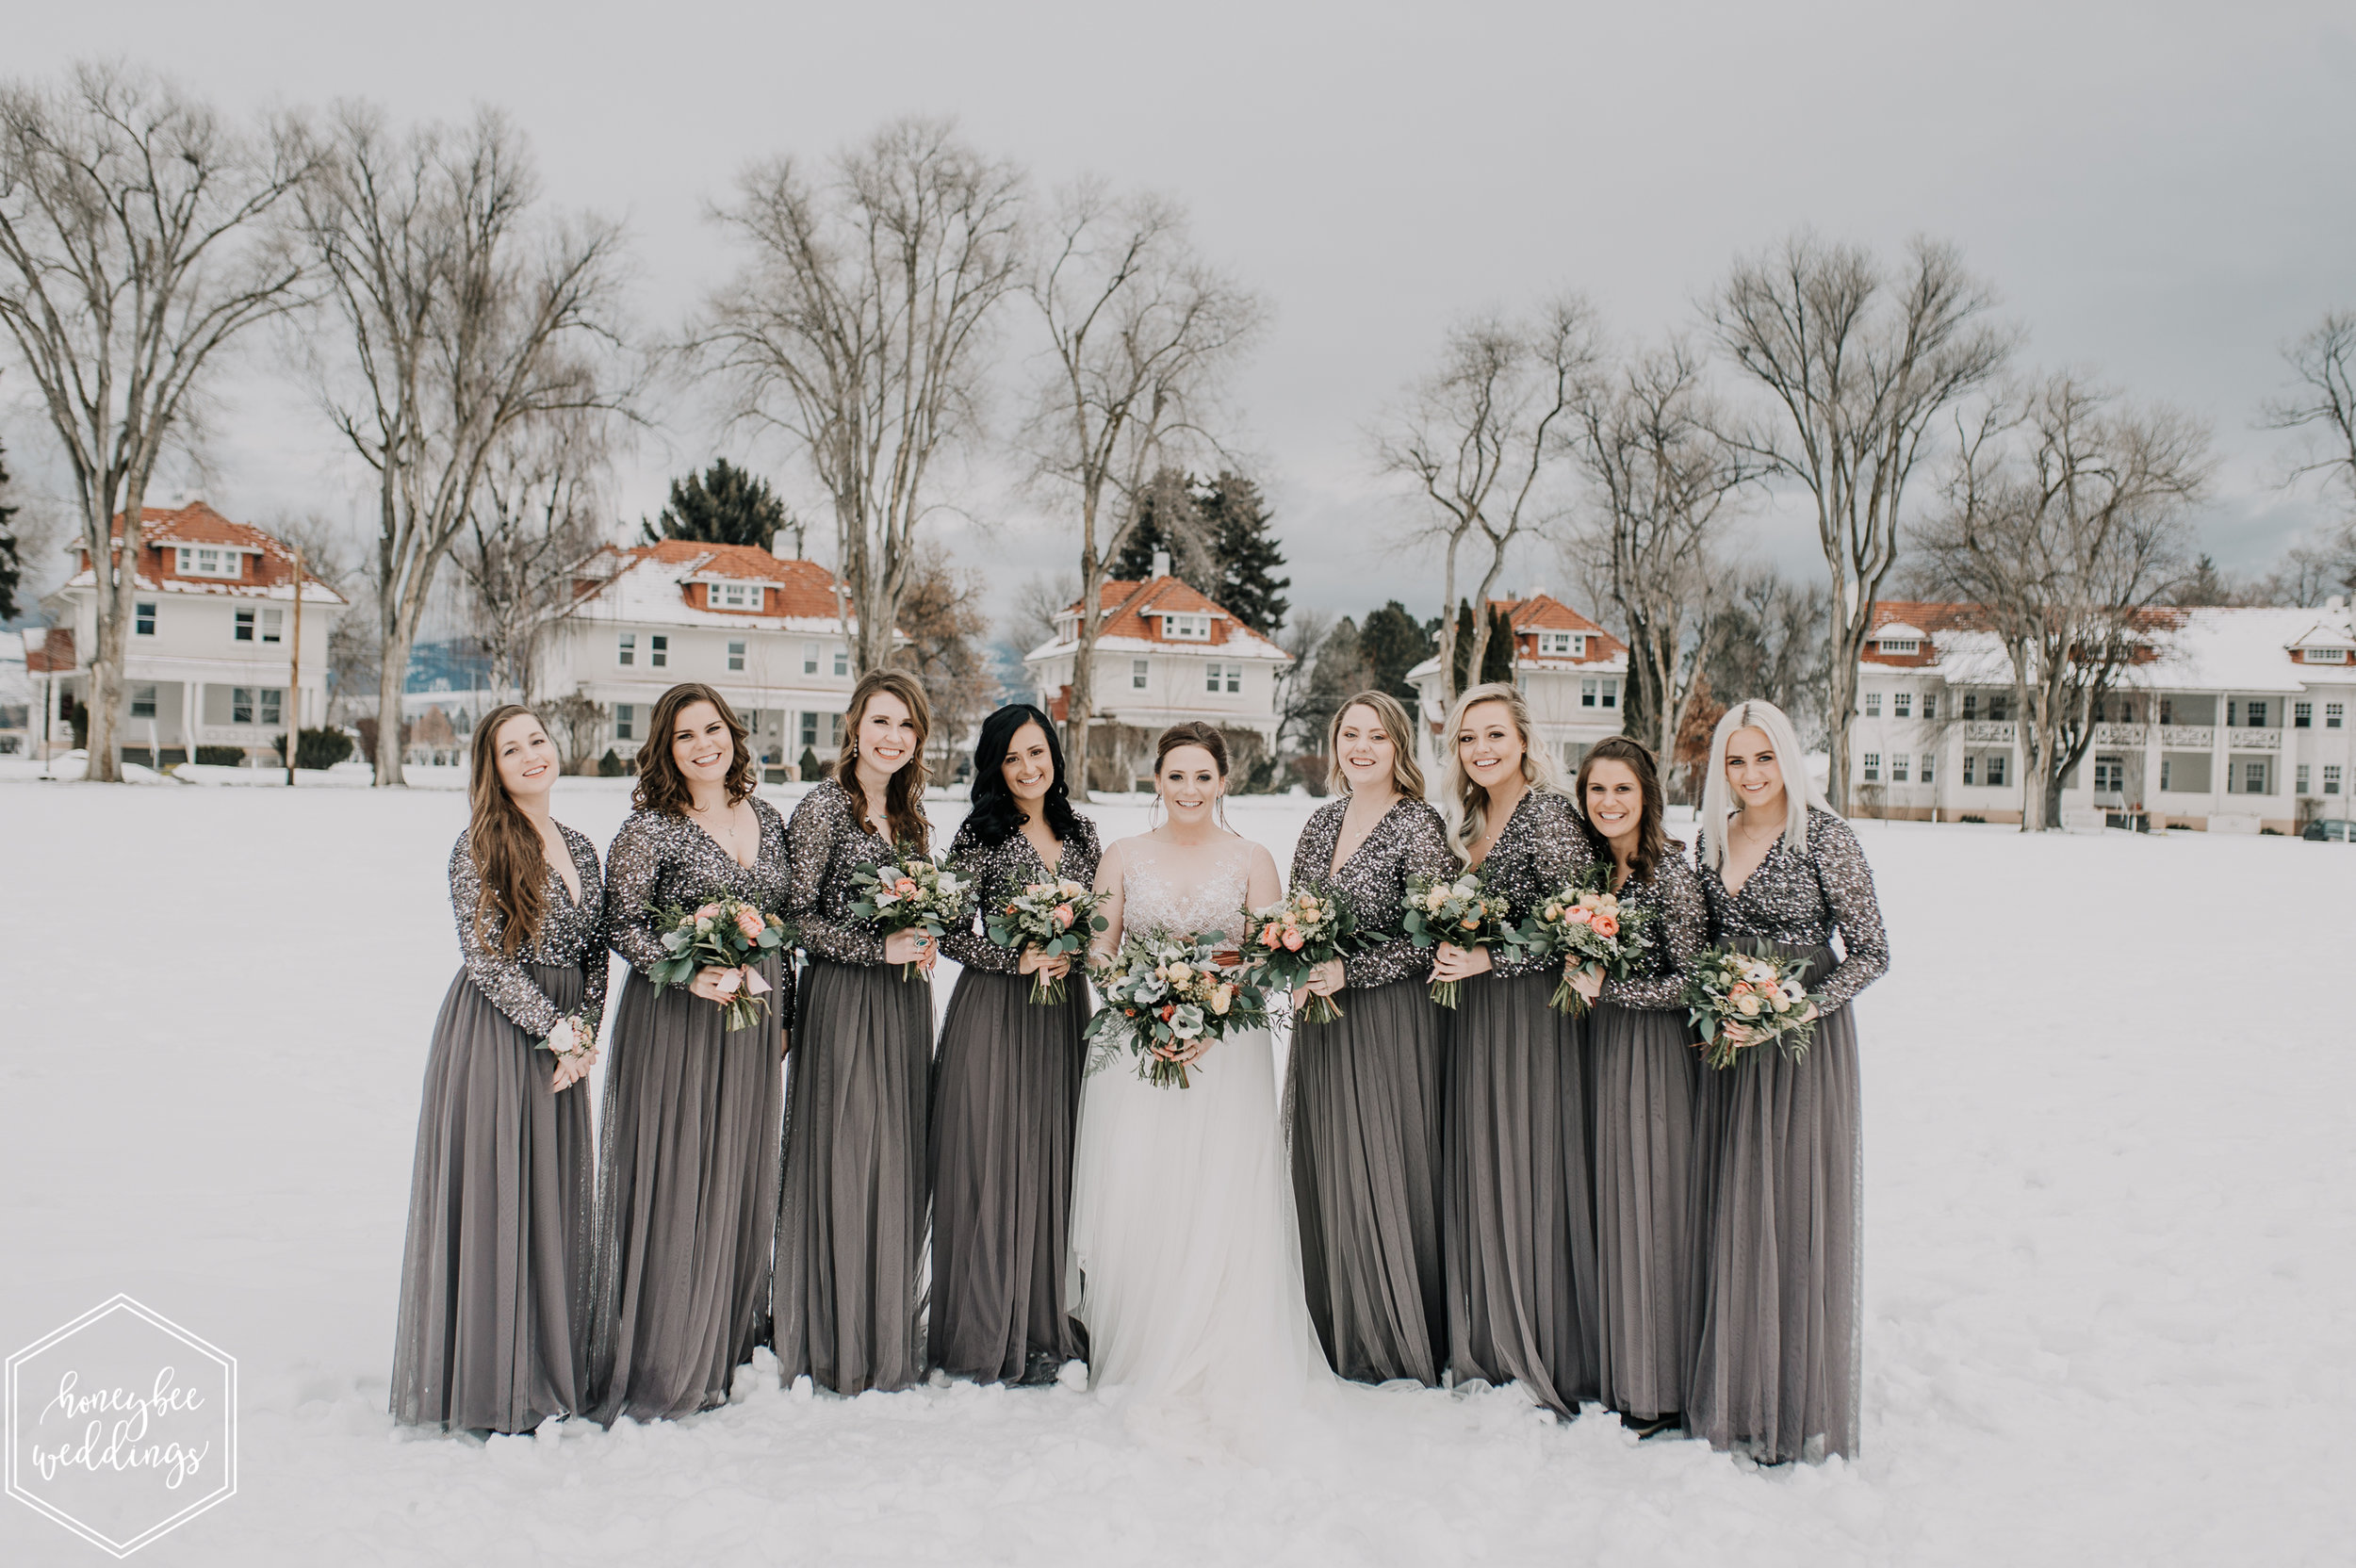 0198Montana Wedding Photographer_Montana winter wedding_Wedding at Fort Missoula_Meri & Carter_January 19, 2018-395.jpg